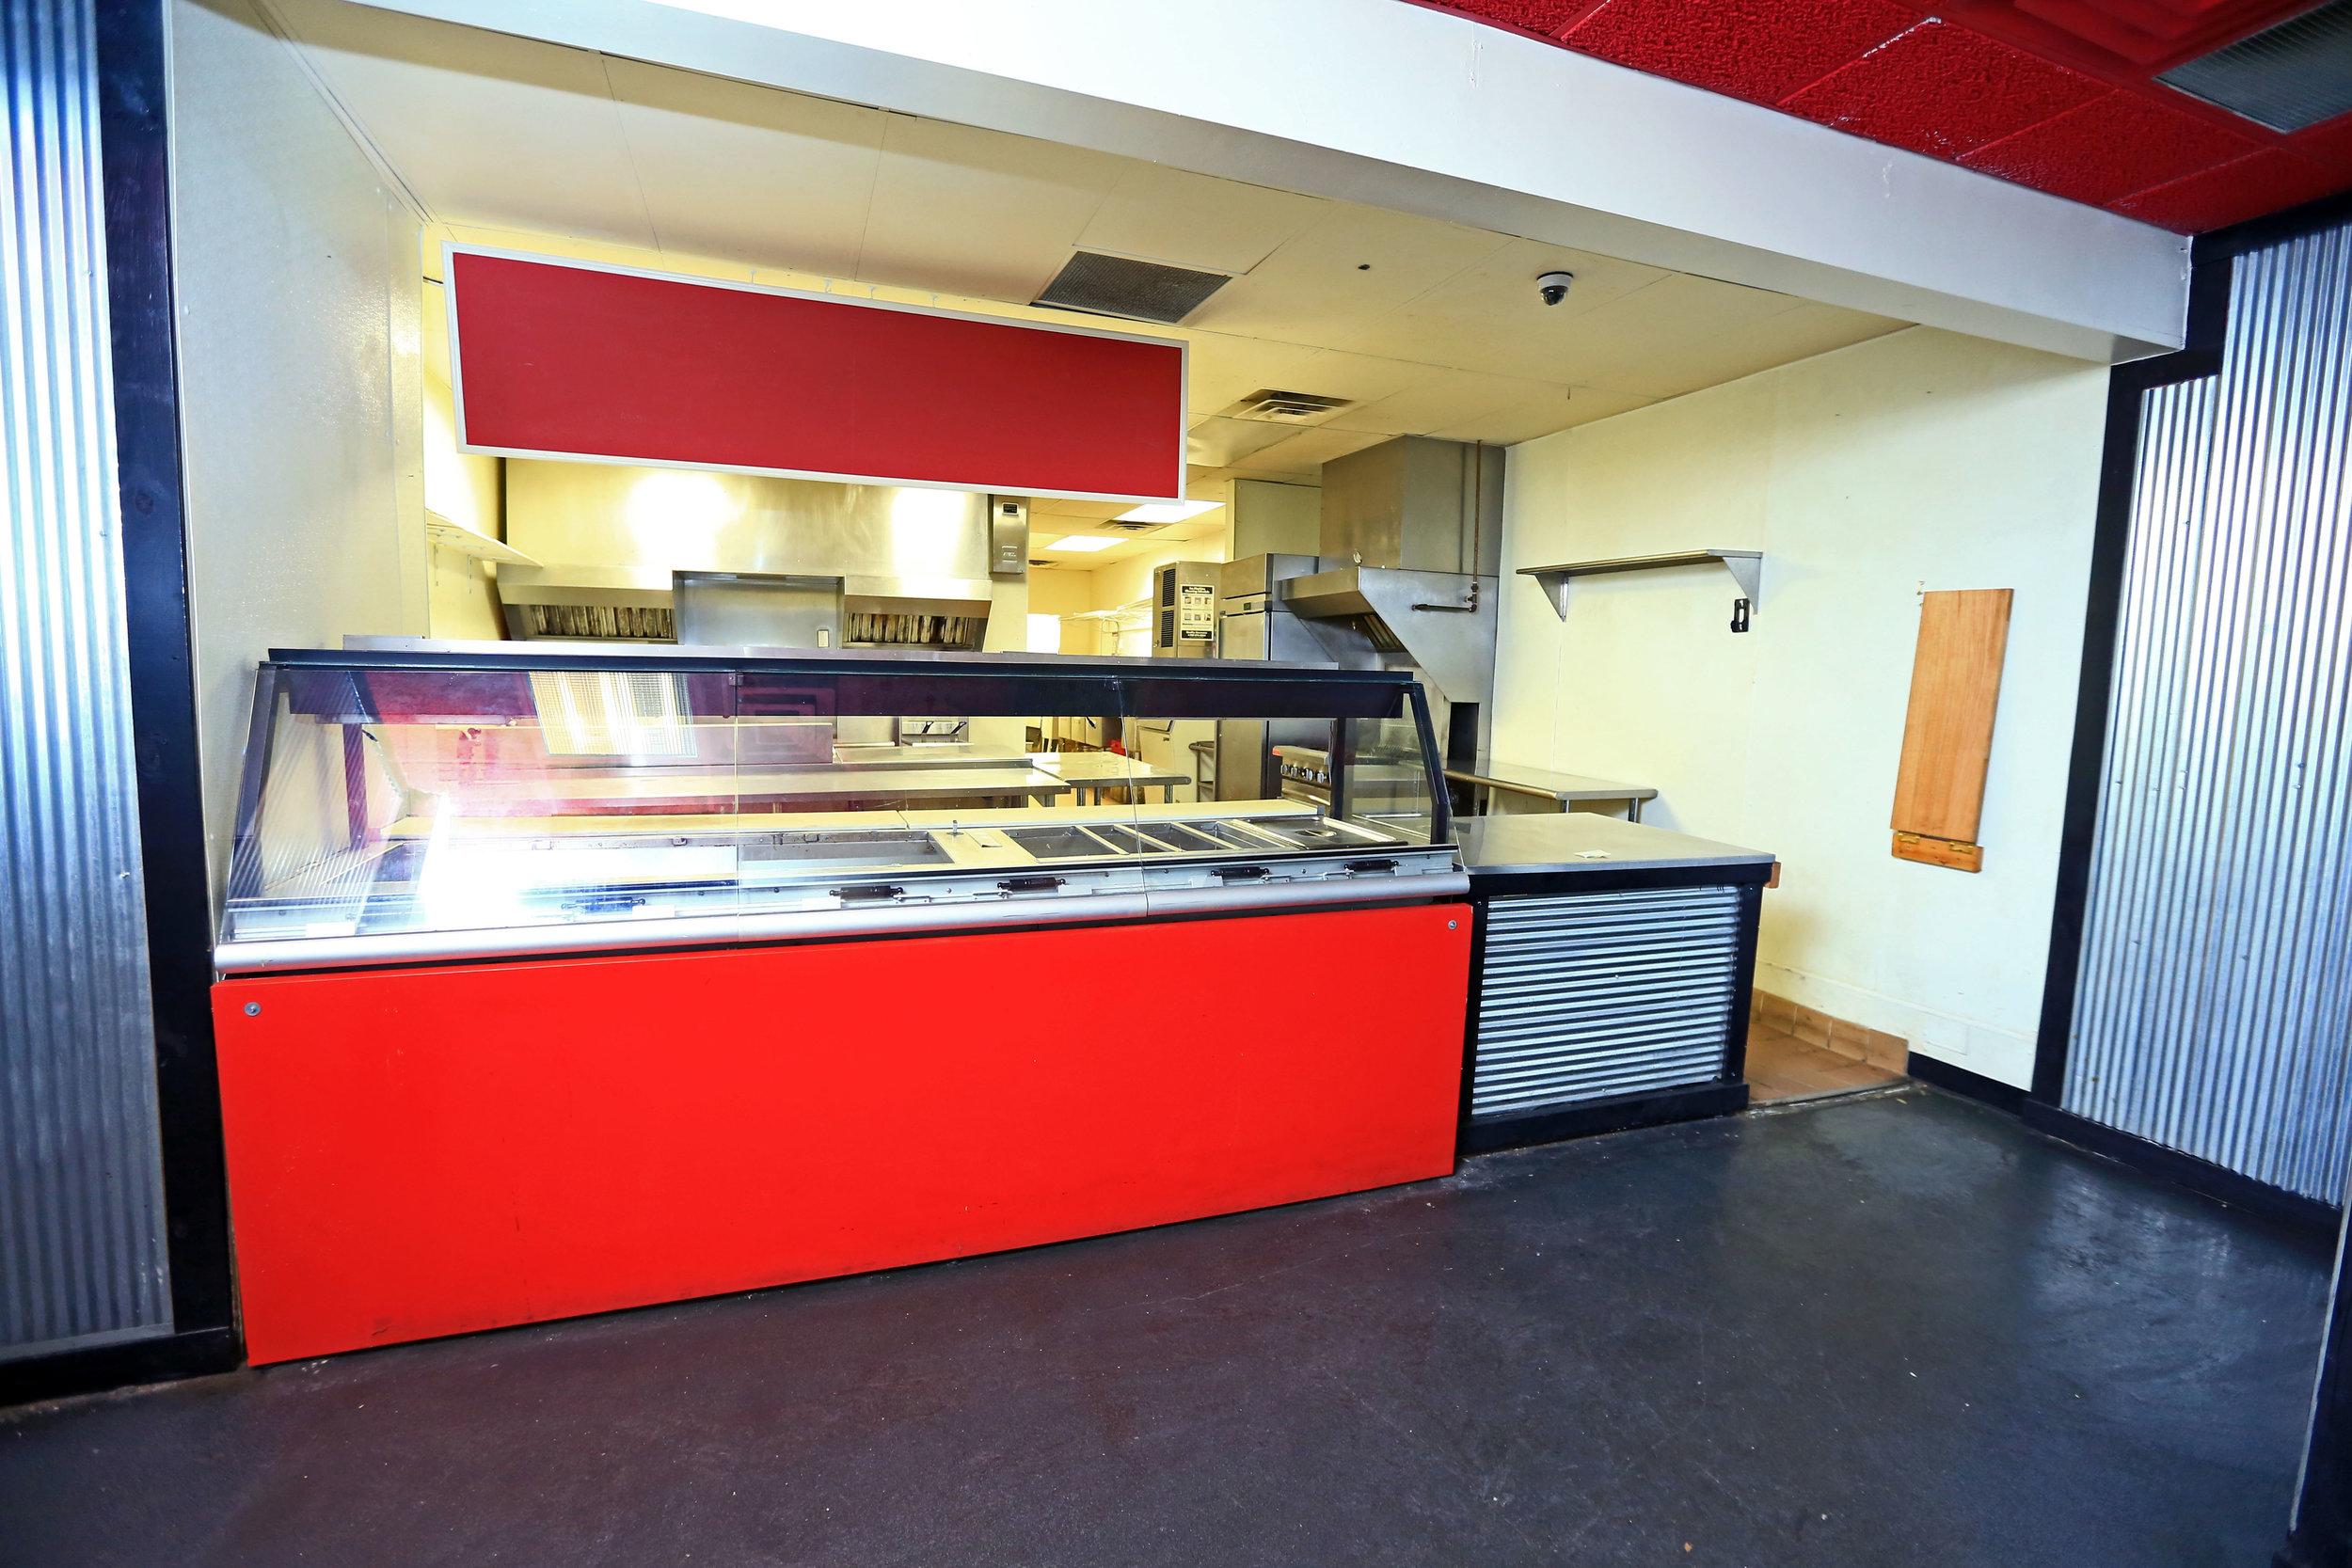 Kitchen of 614 Adams St, Toledo, OH 43604, Pre-construction 2015 2015